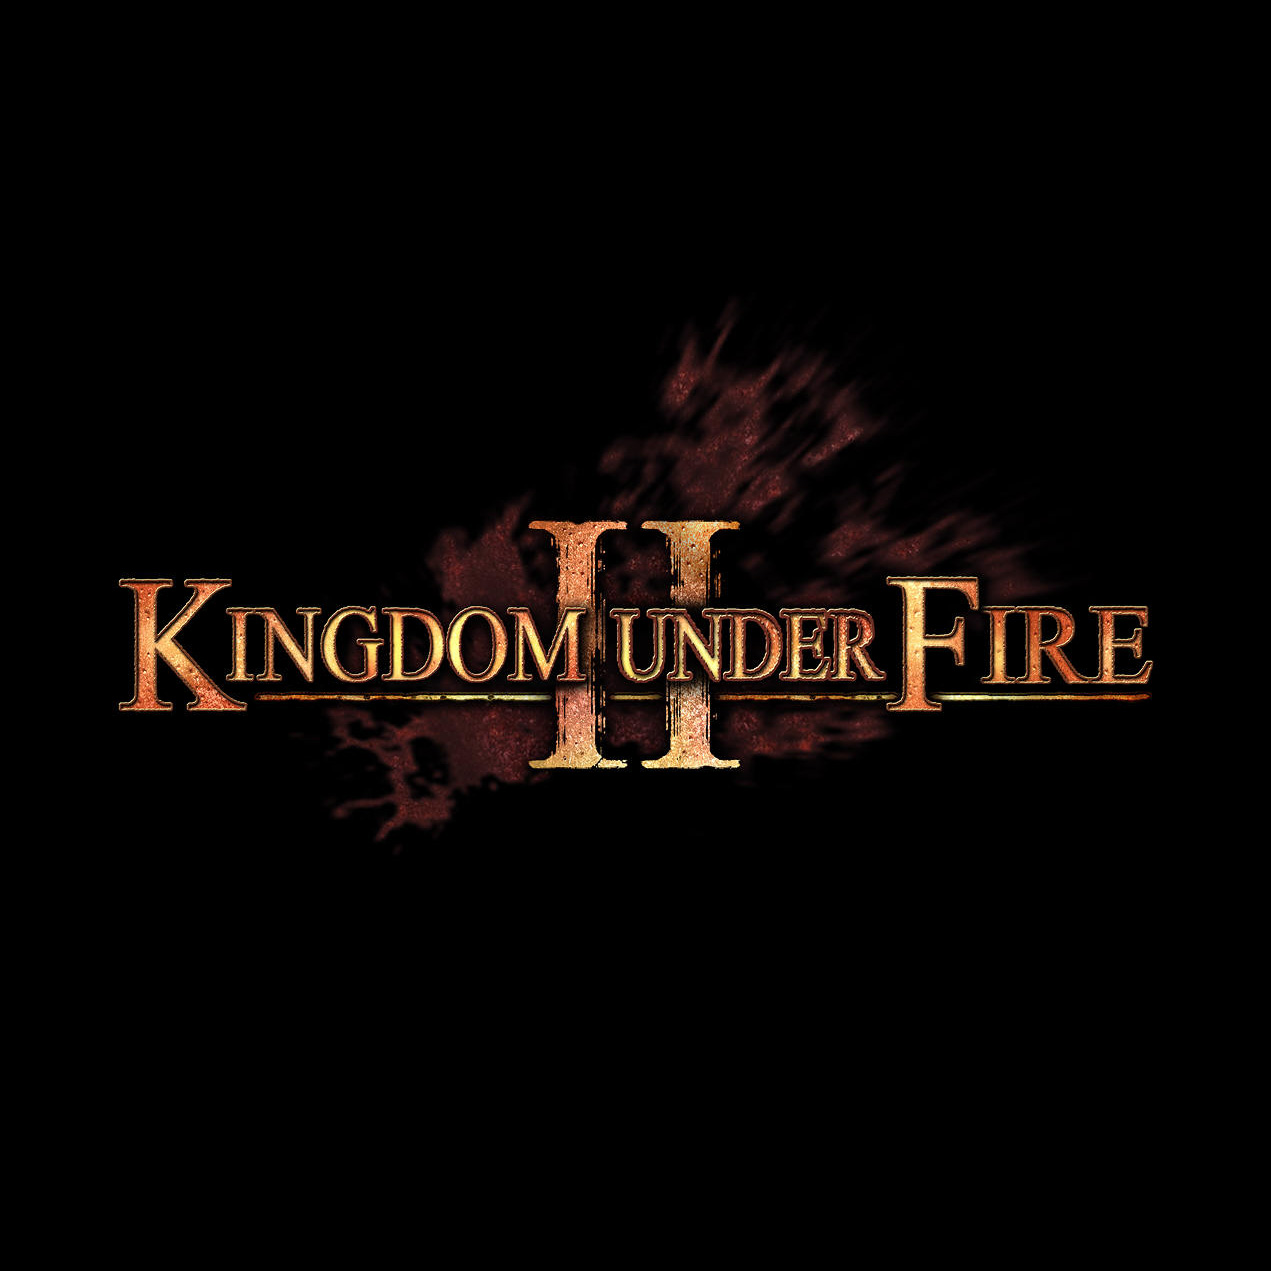 Kingdom under fire porn nude scene